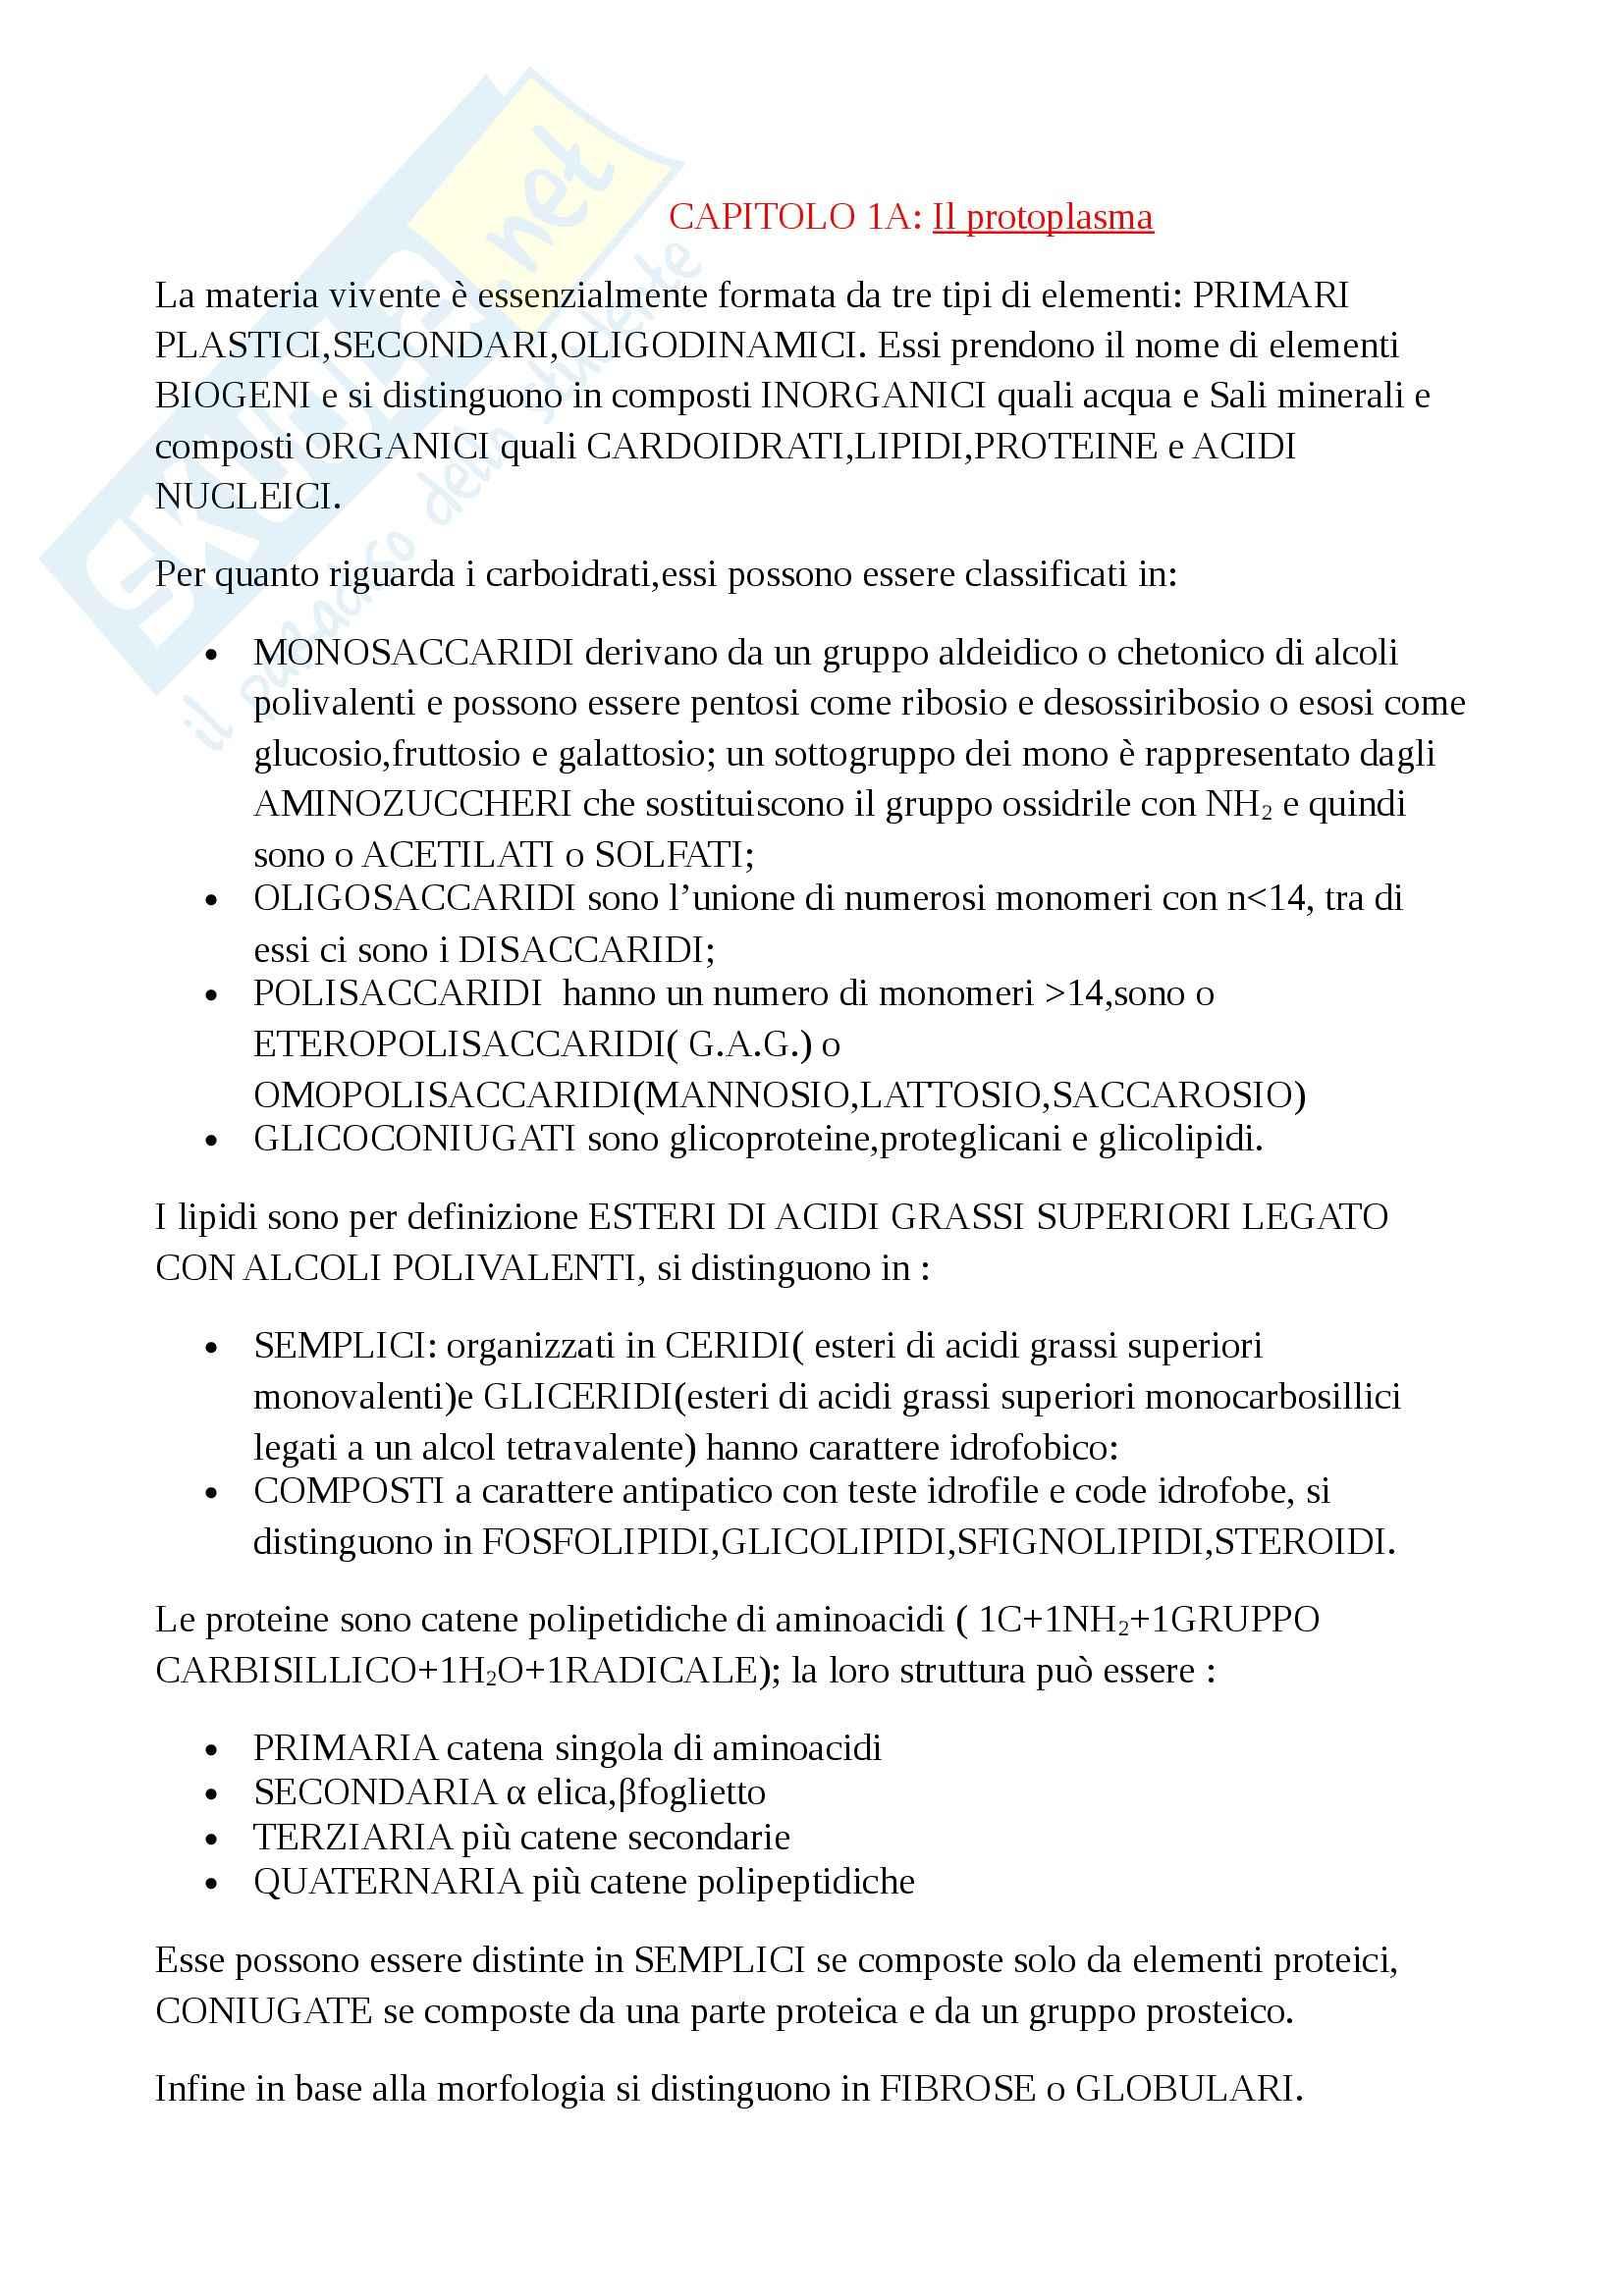 Citologia - cap. 1/A sul protoplasma